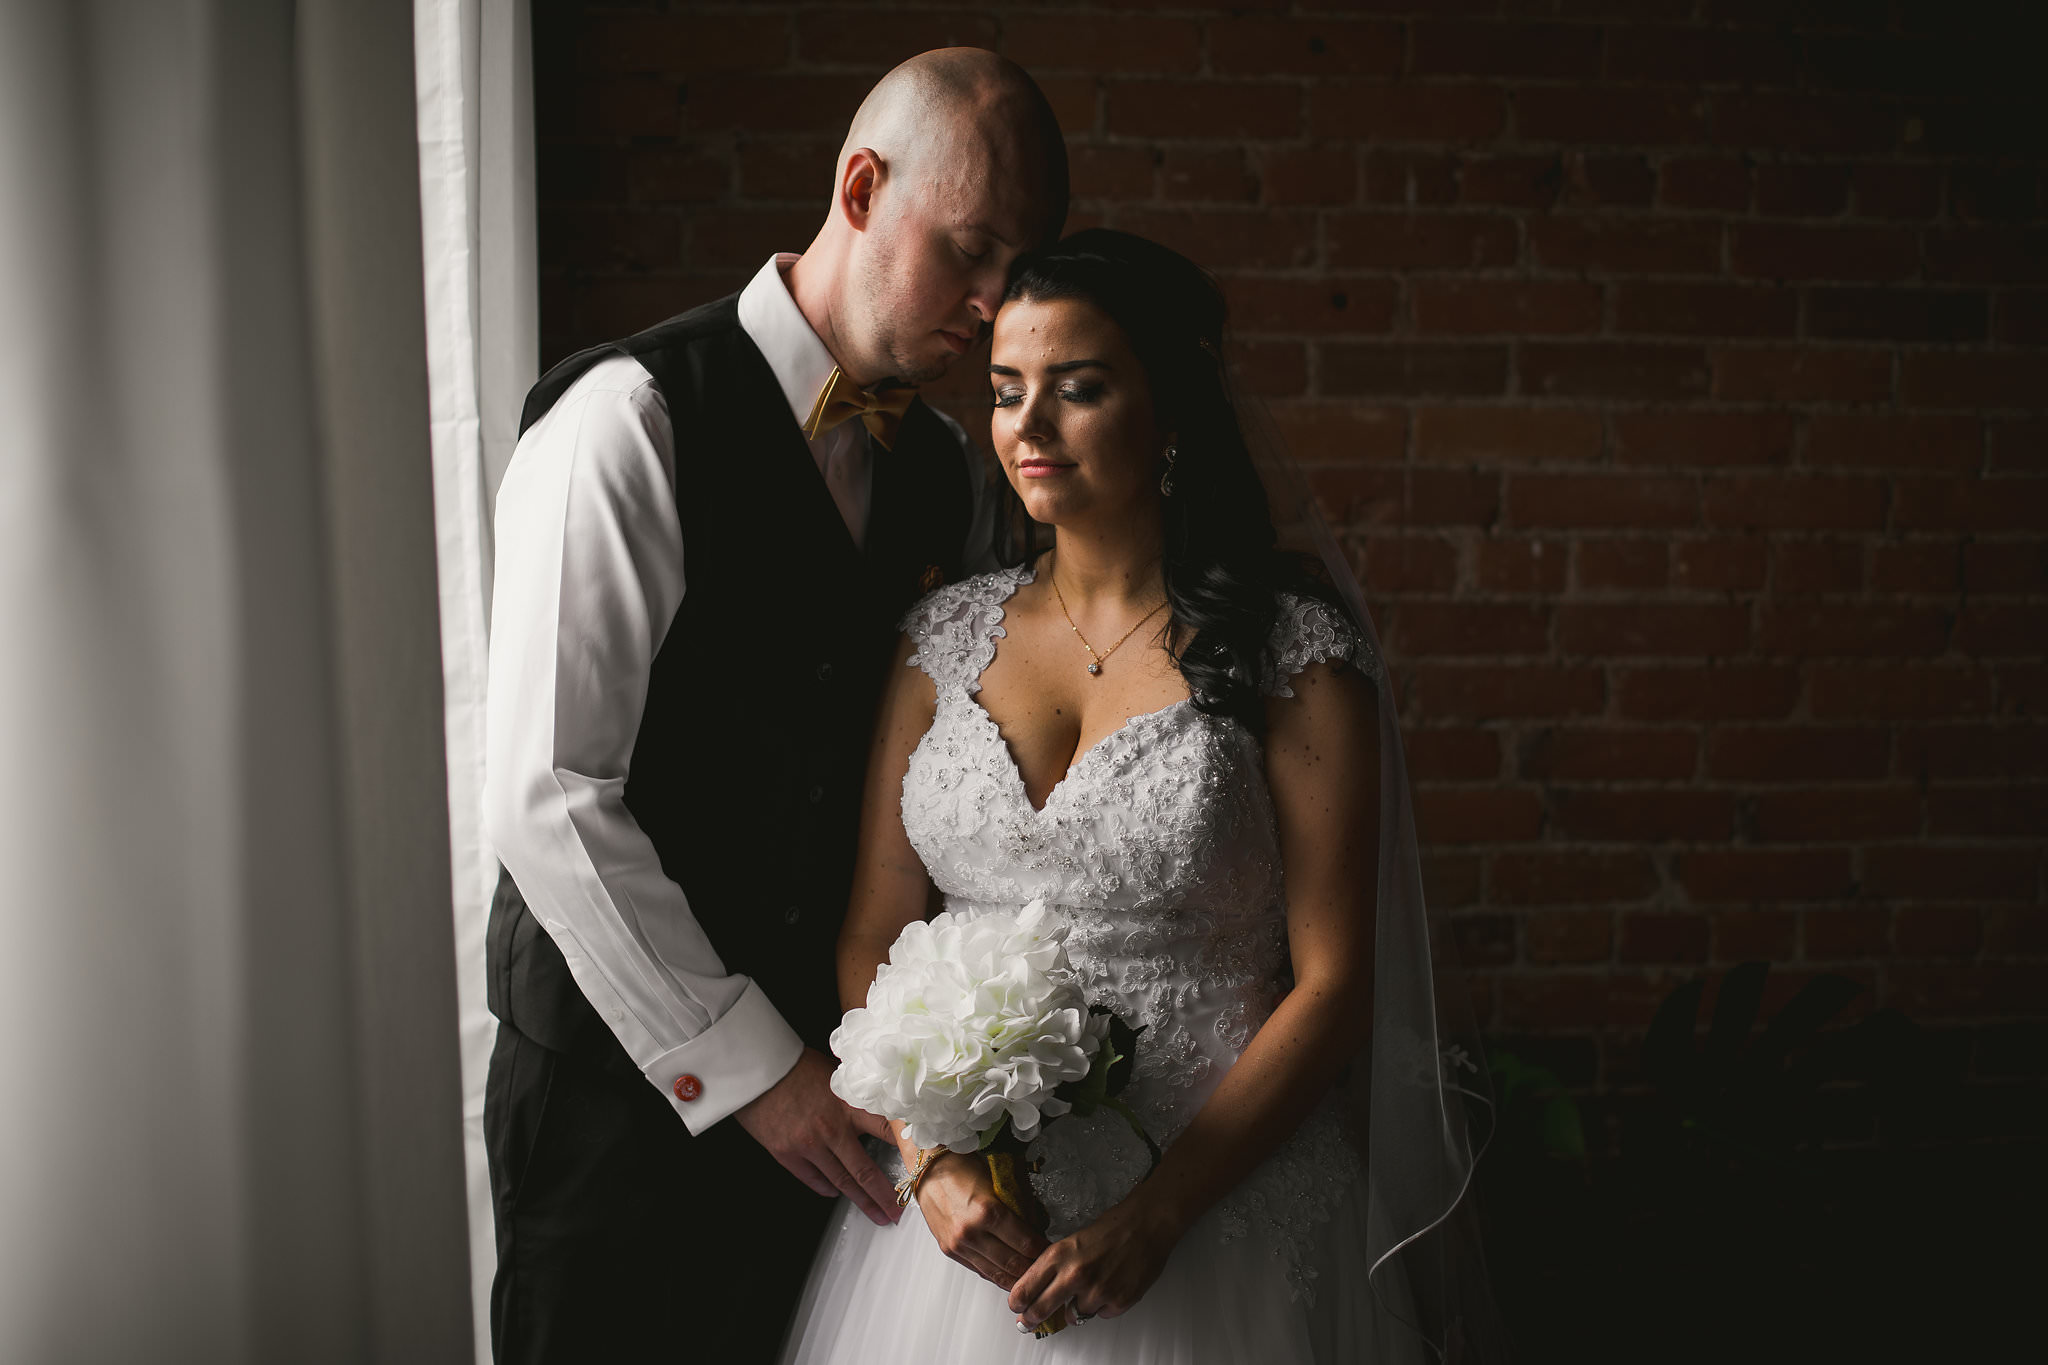 Kristen Adam Kindred Loft Whitby Wedding Photos 301 - Durham Wedding Photographer: Kindred Loft Wedding Photos